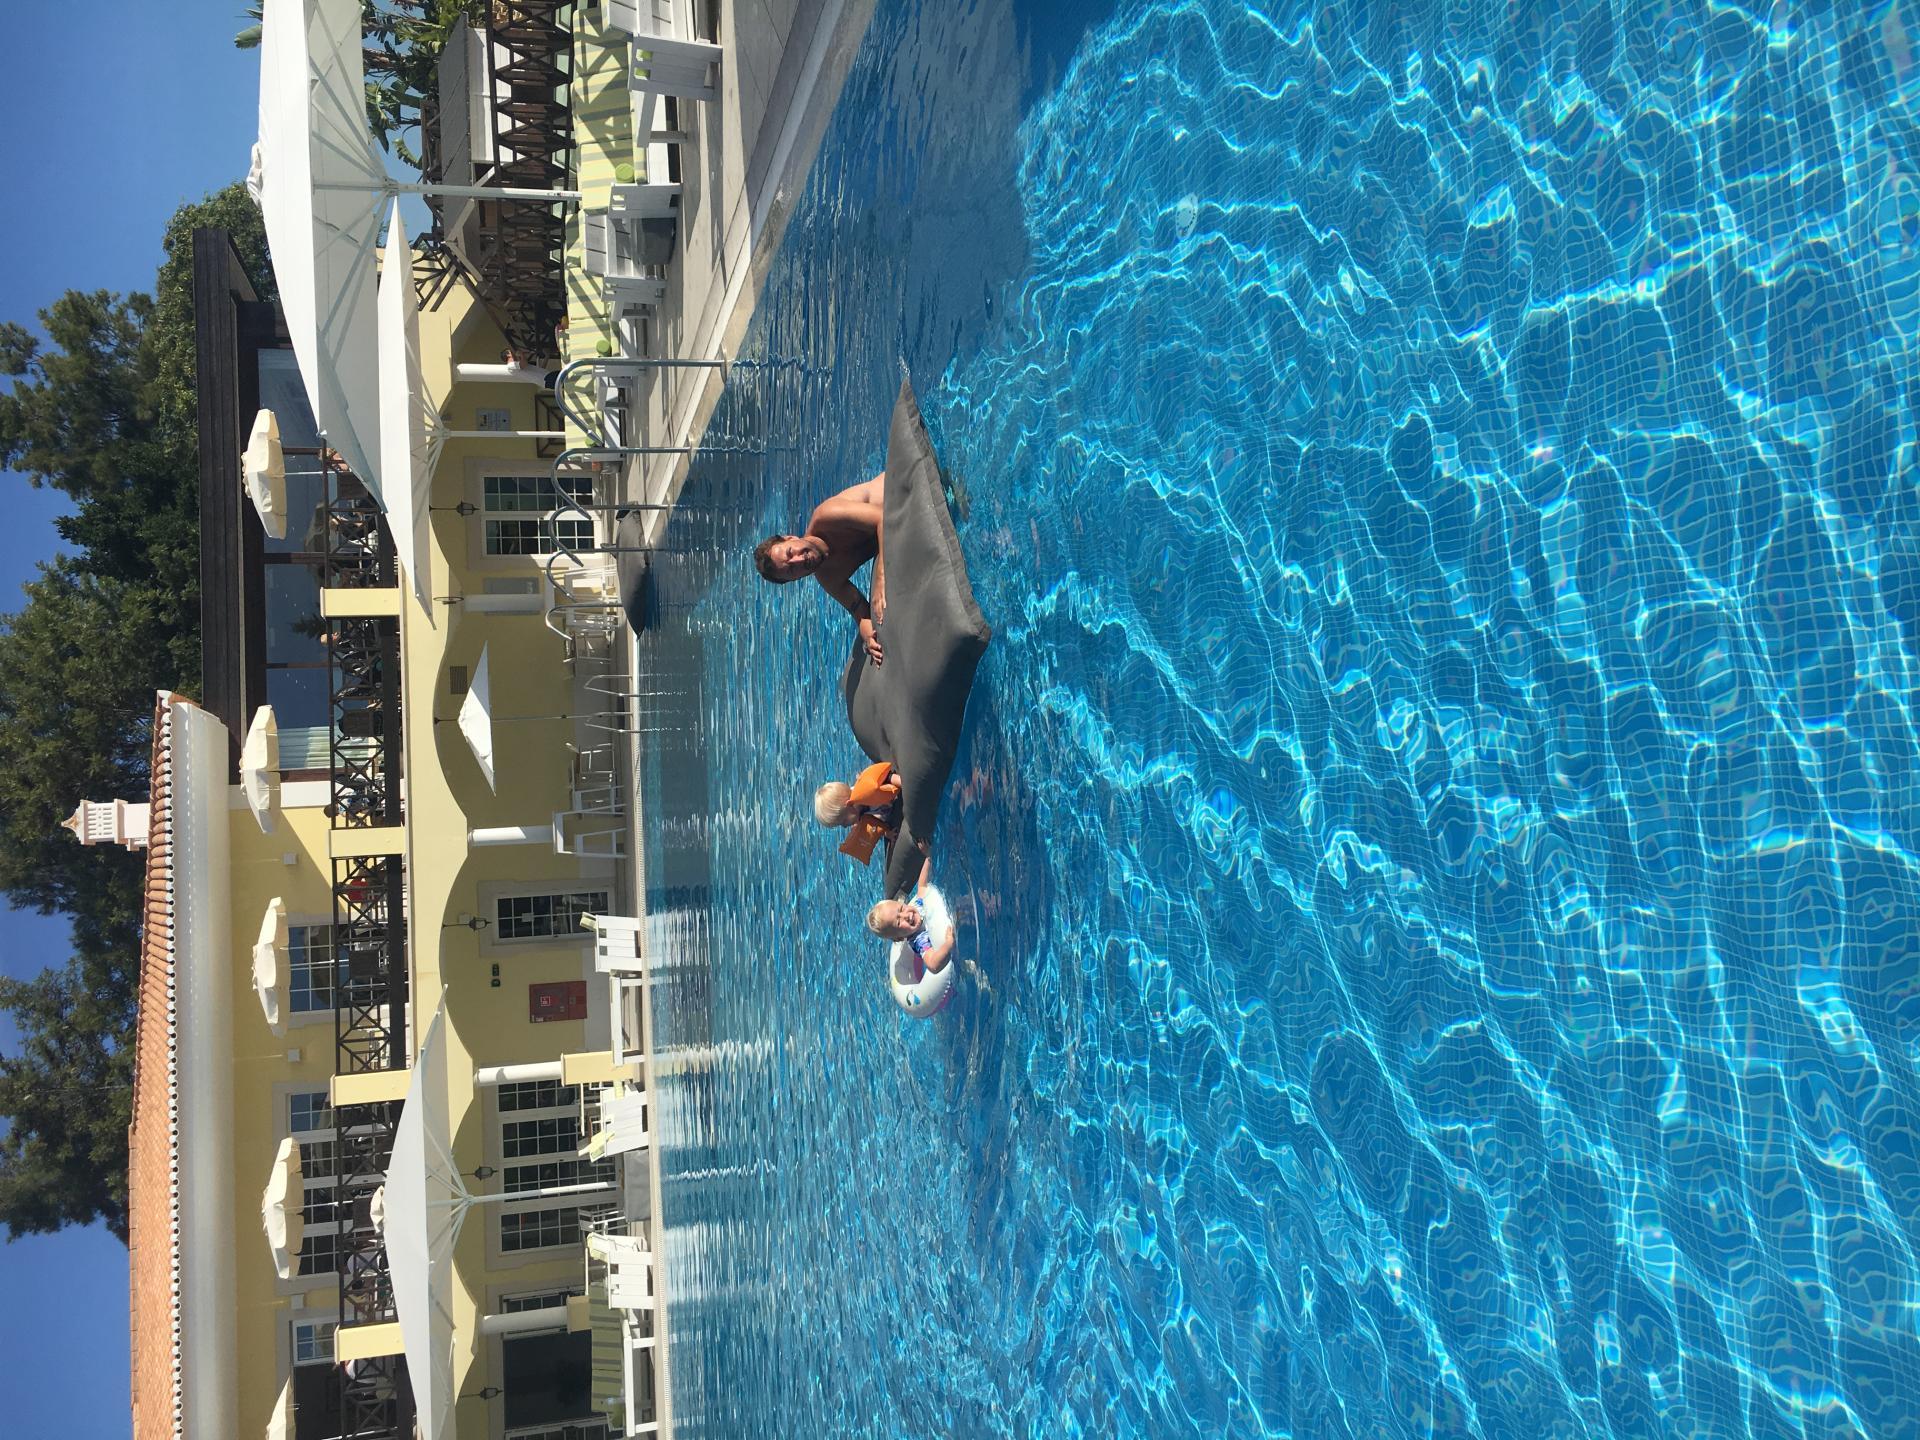 swimmingpool at Martinhal Quinta